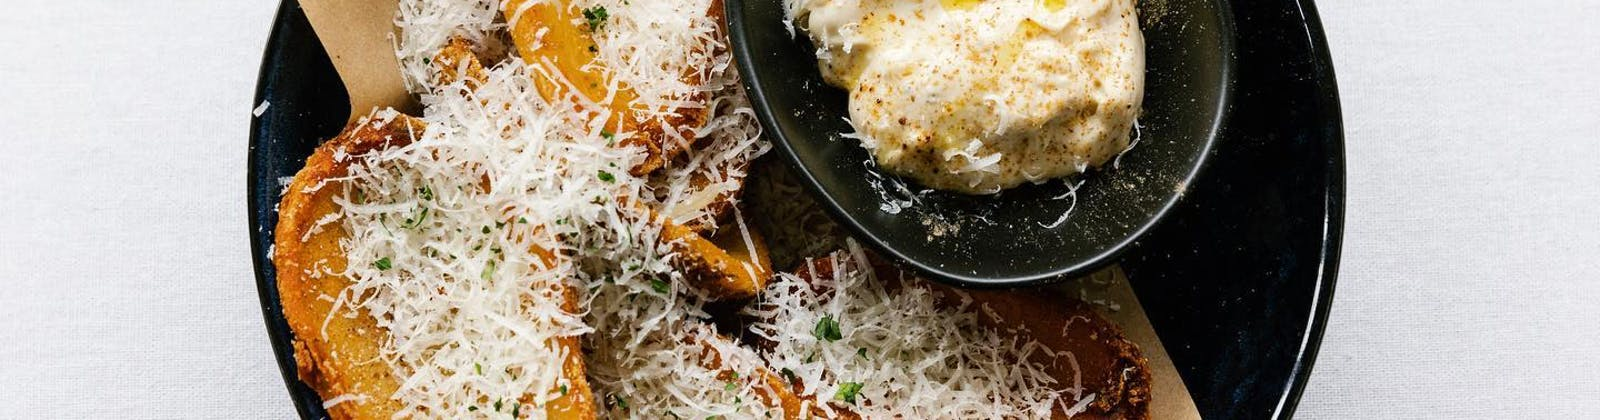 elmo's potato skins and truffle dip